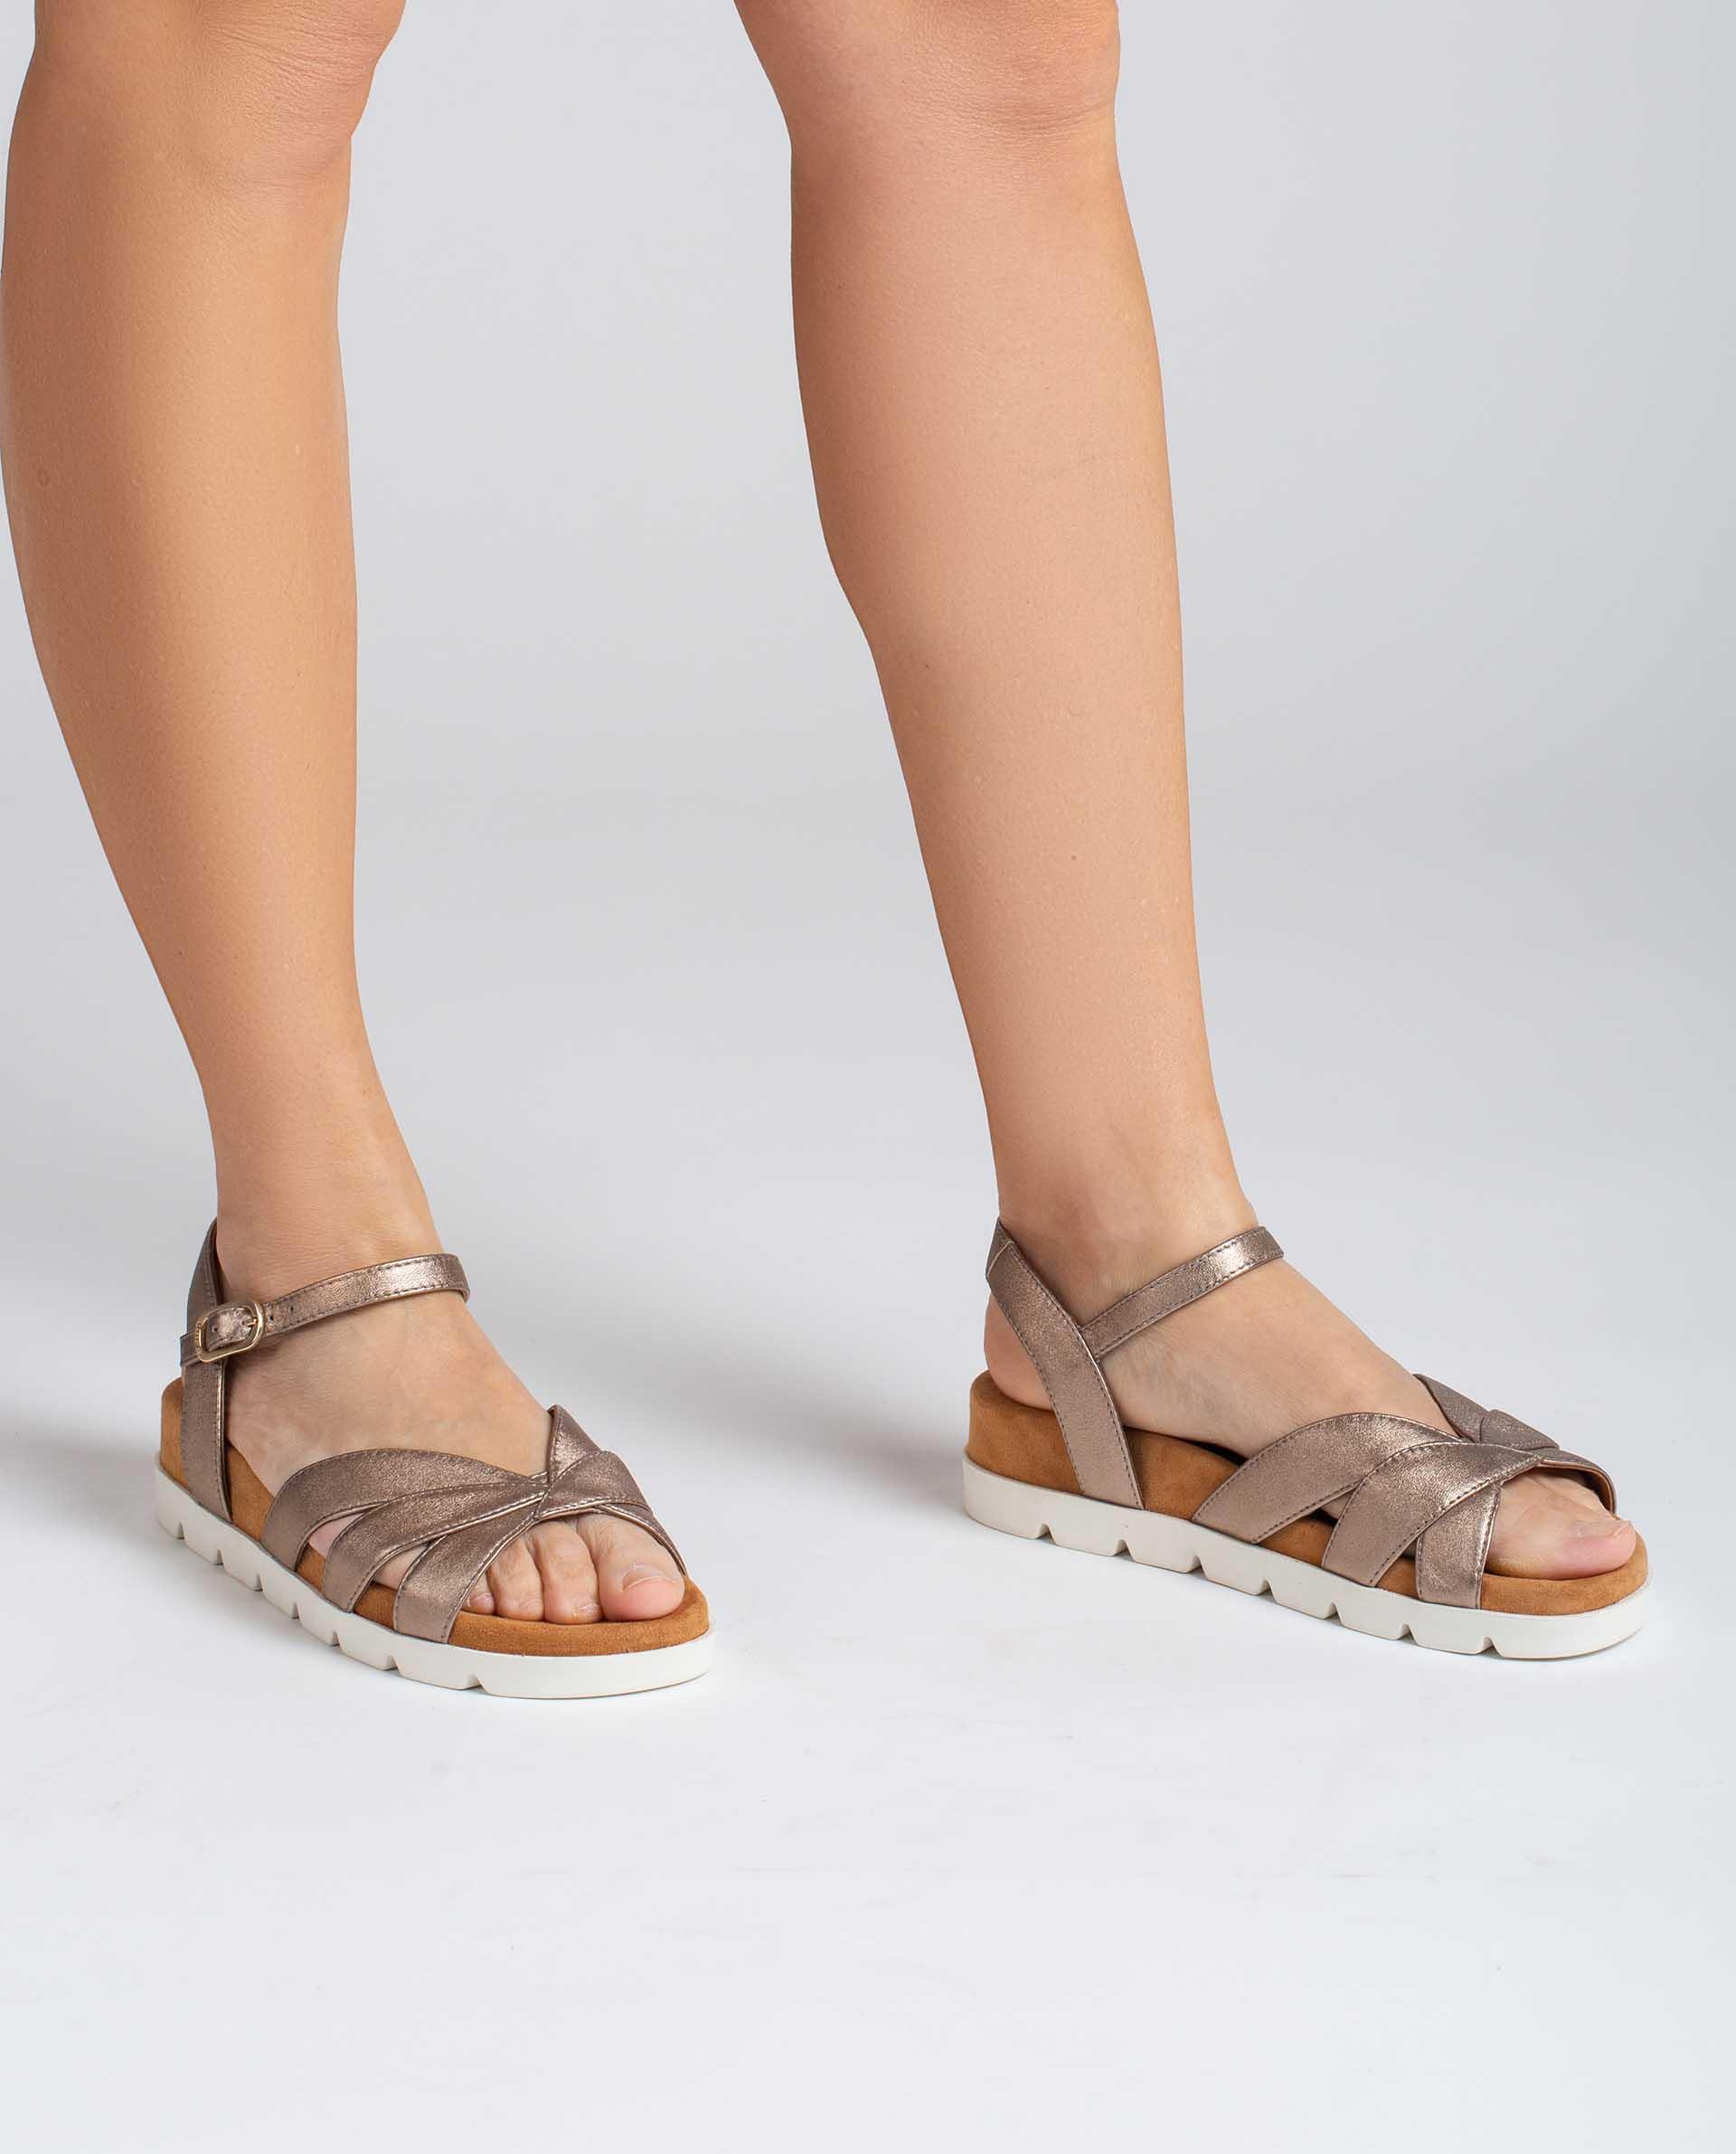 UNISA Sandalia plana en piel metalizada con piso deportivo CEDILLO_LMT